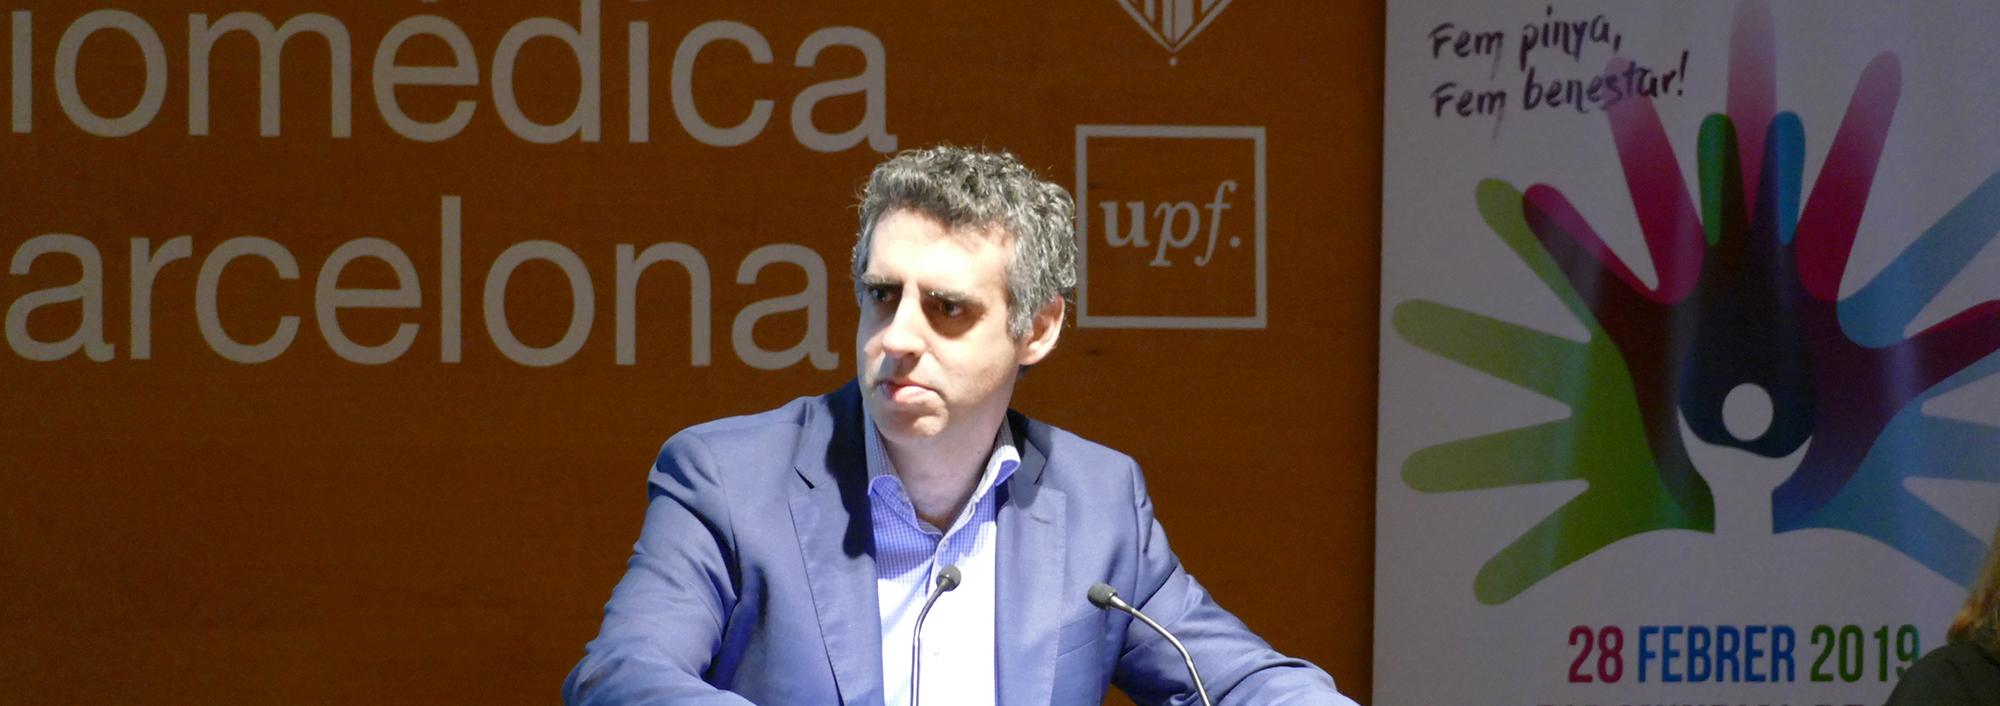 Manel Esteller, director del Institut de Recerca contra la Leucèmia Josep Carreras.